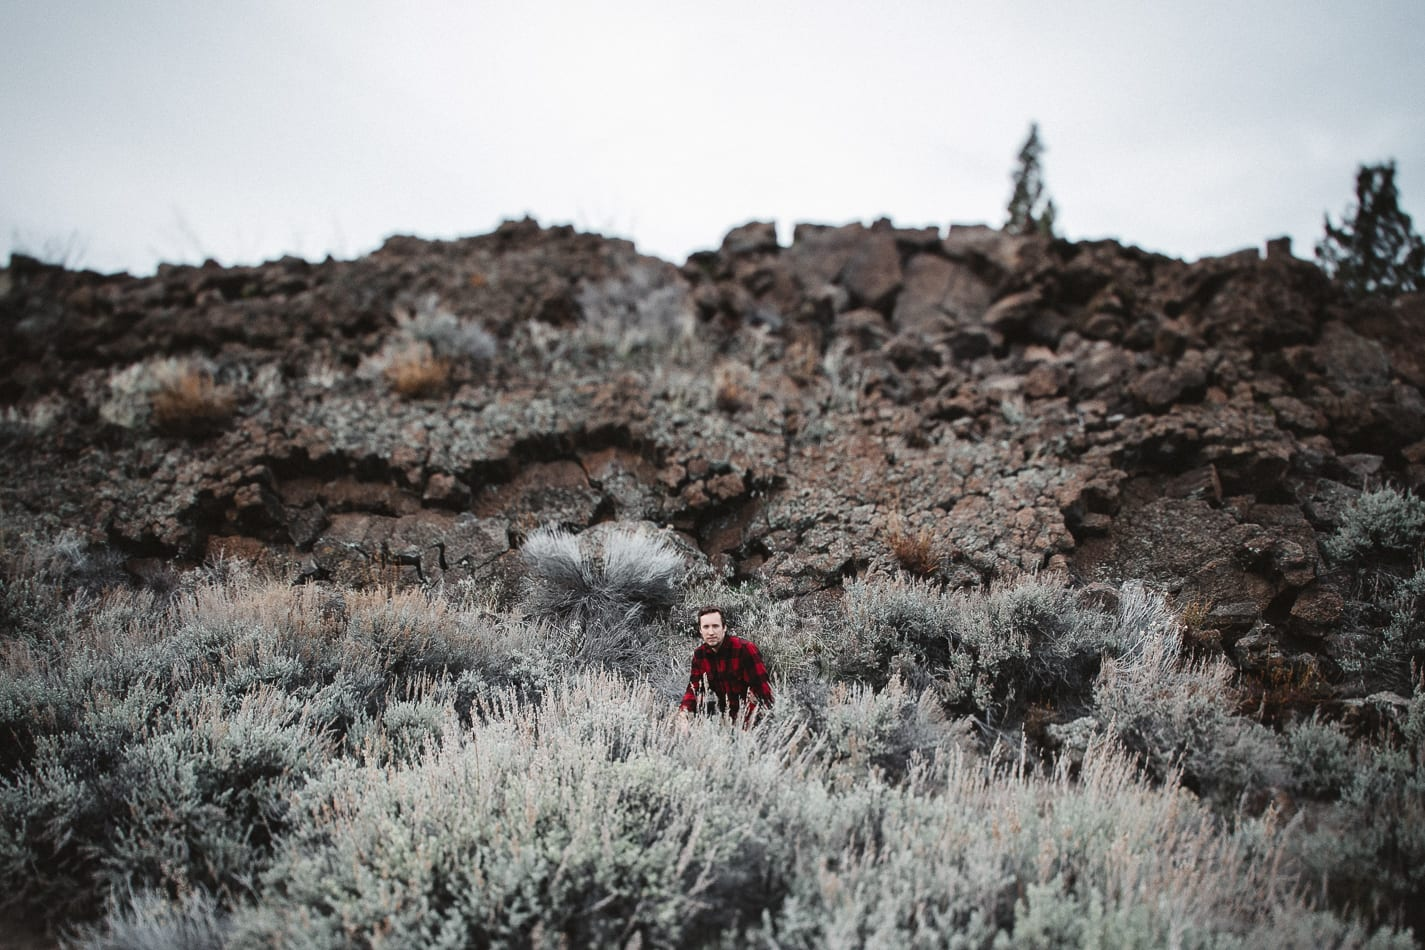 pluto-cave-mount-shasta-lifestyle-portrati-photo-36